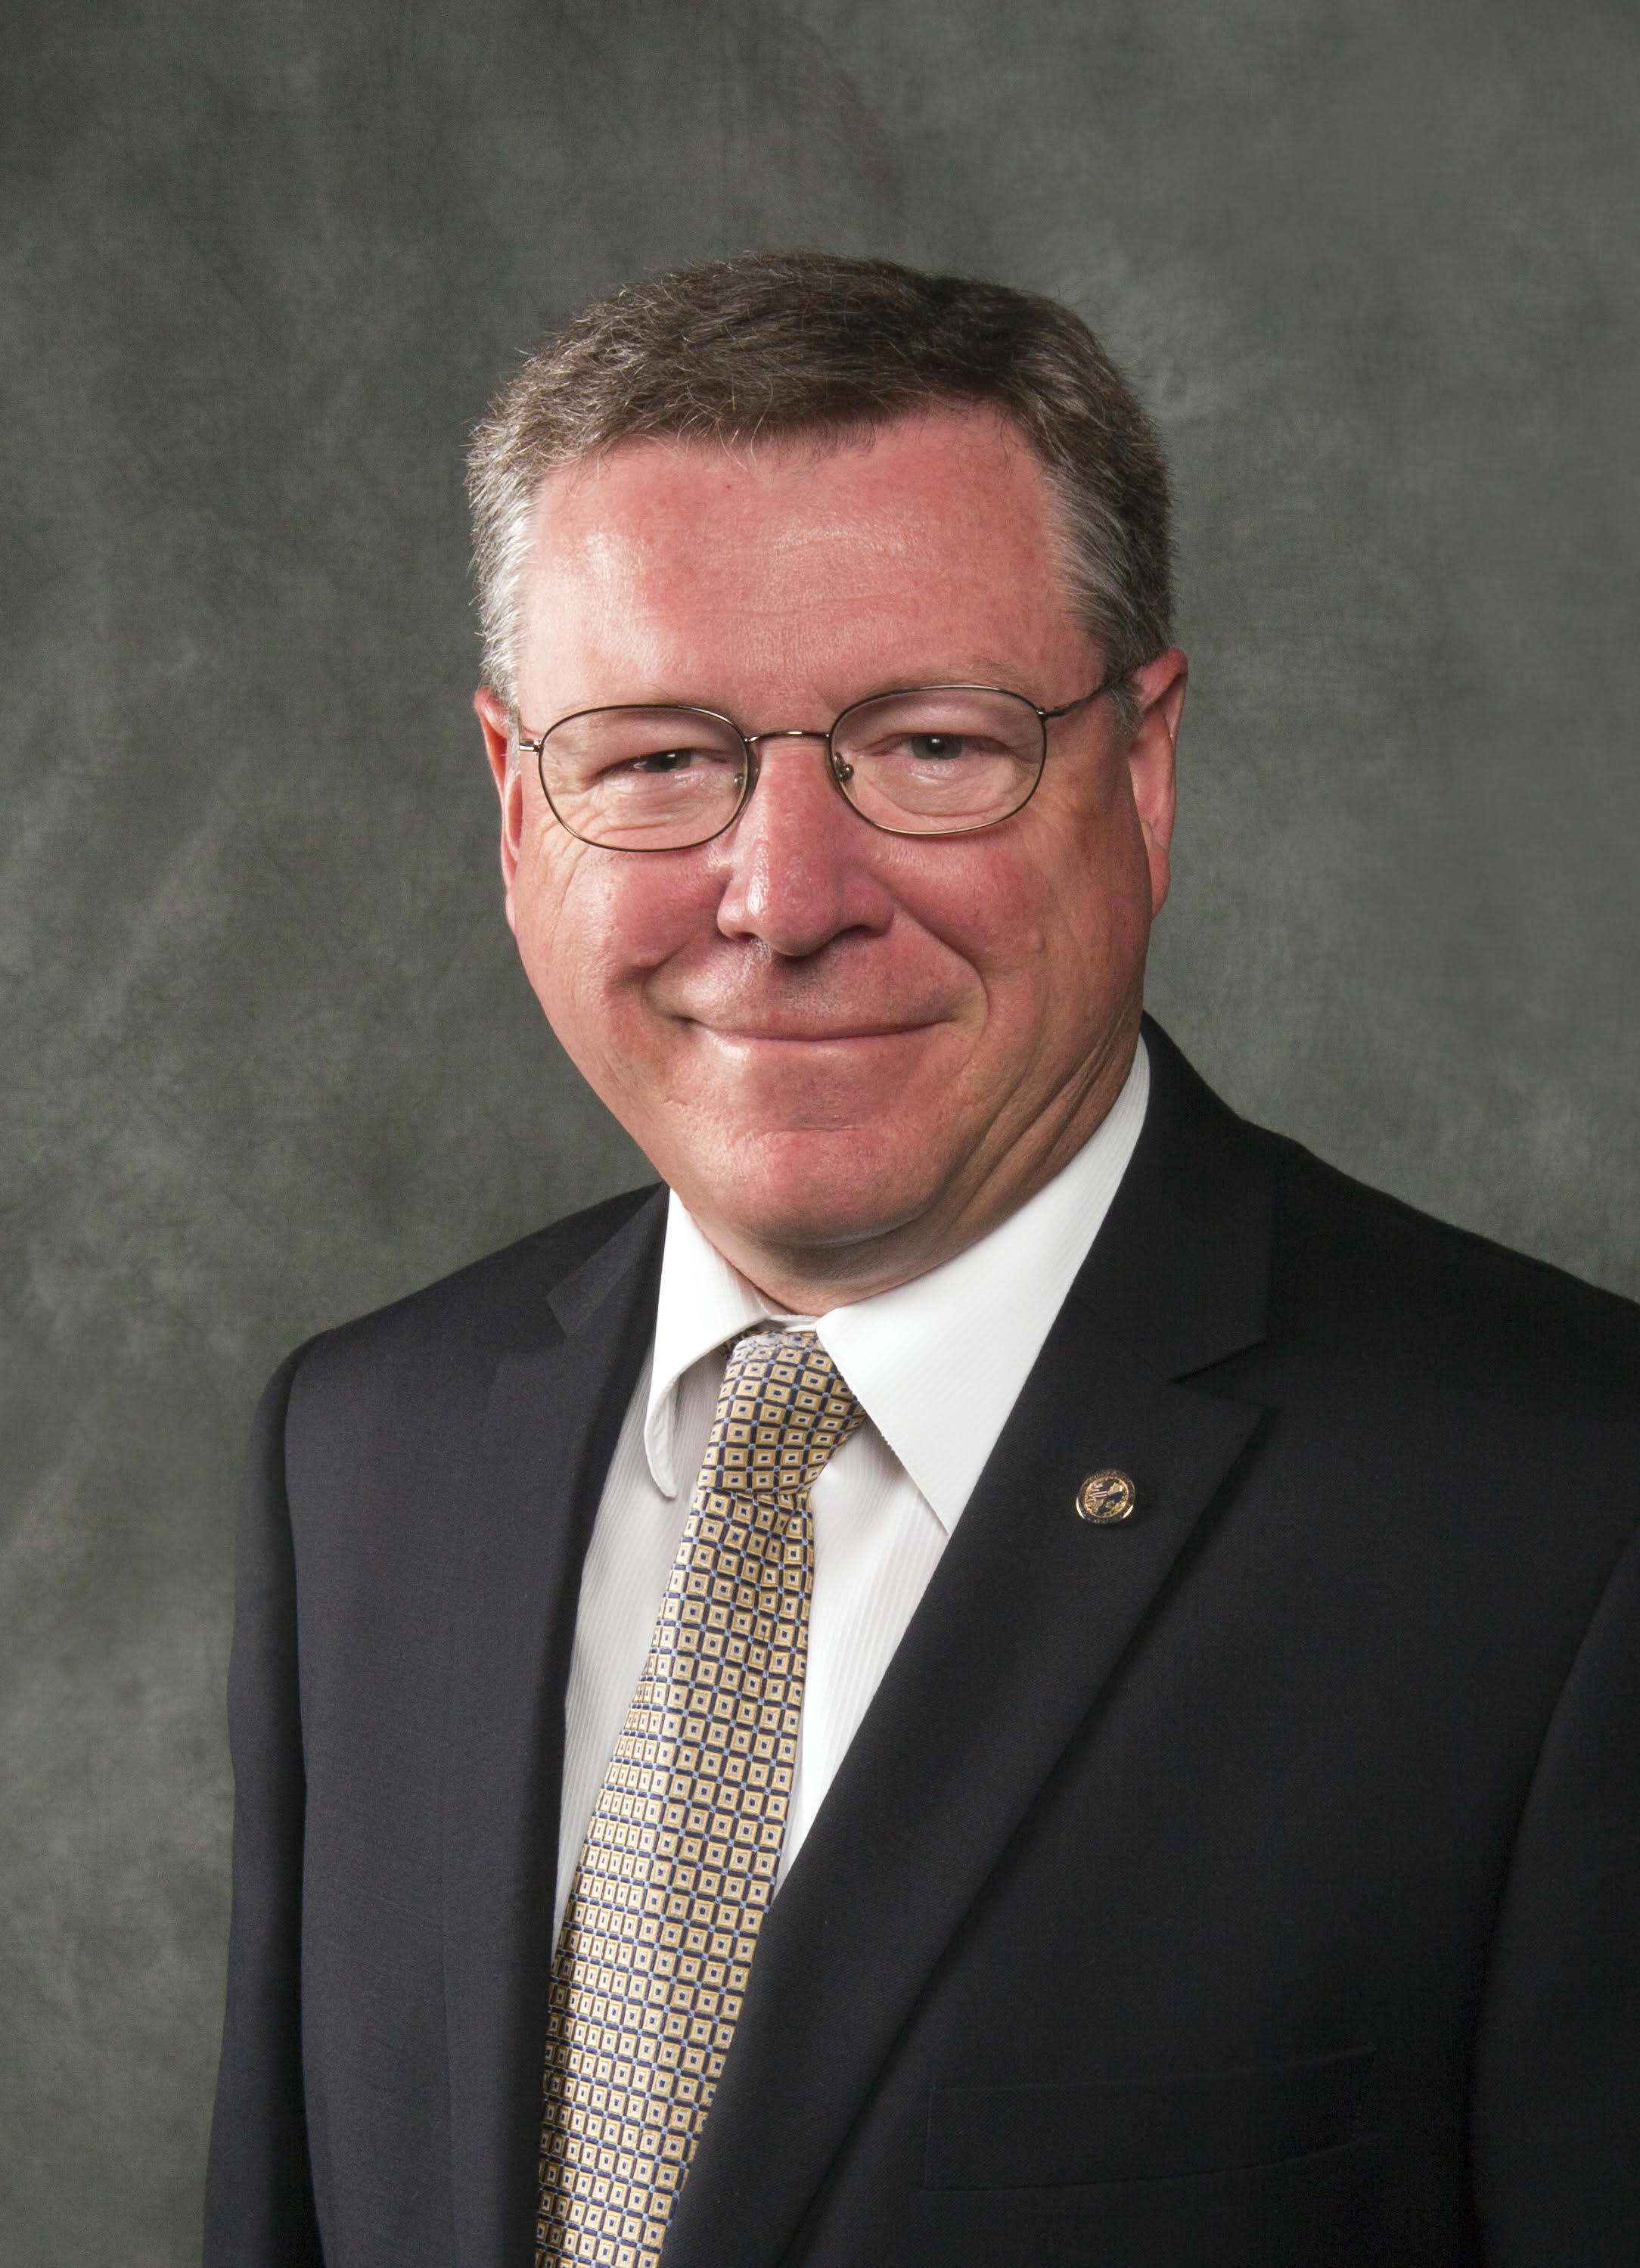 Kim W. Hawkes